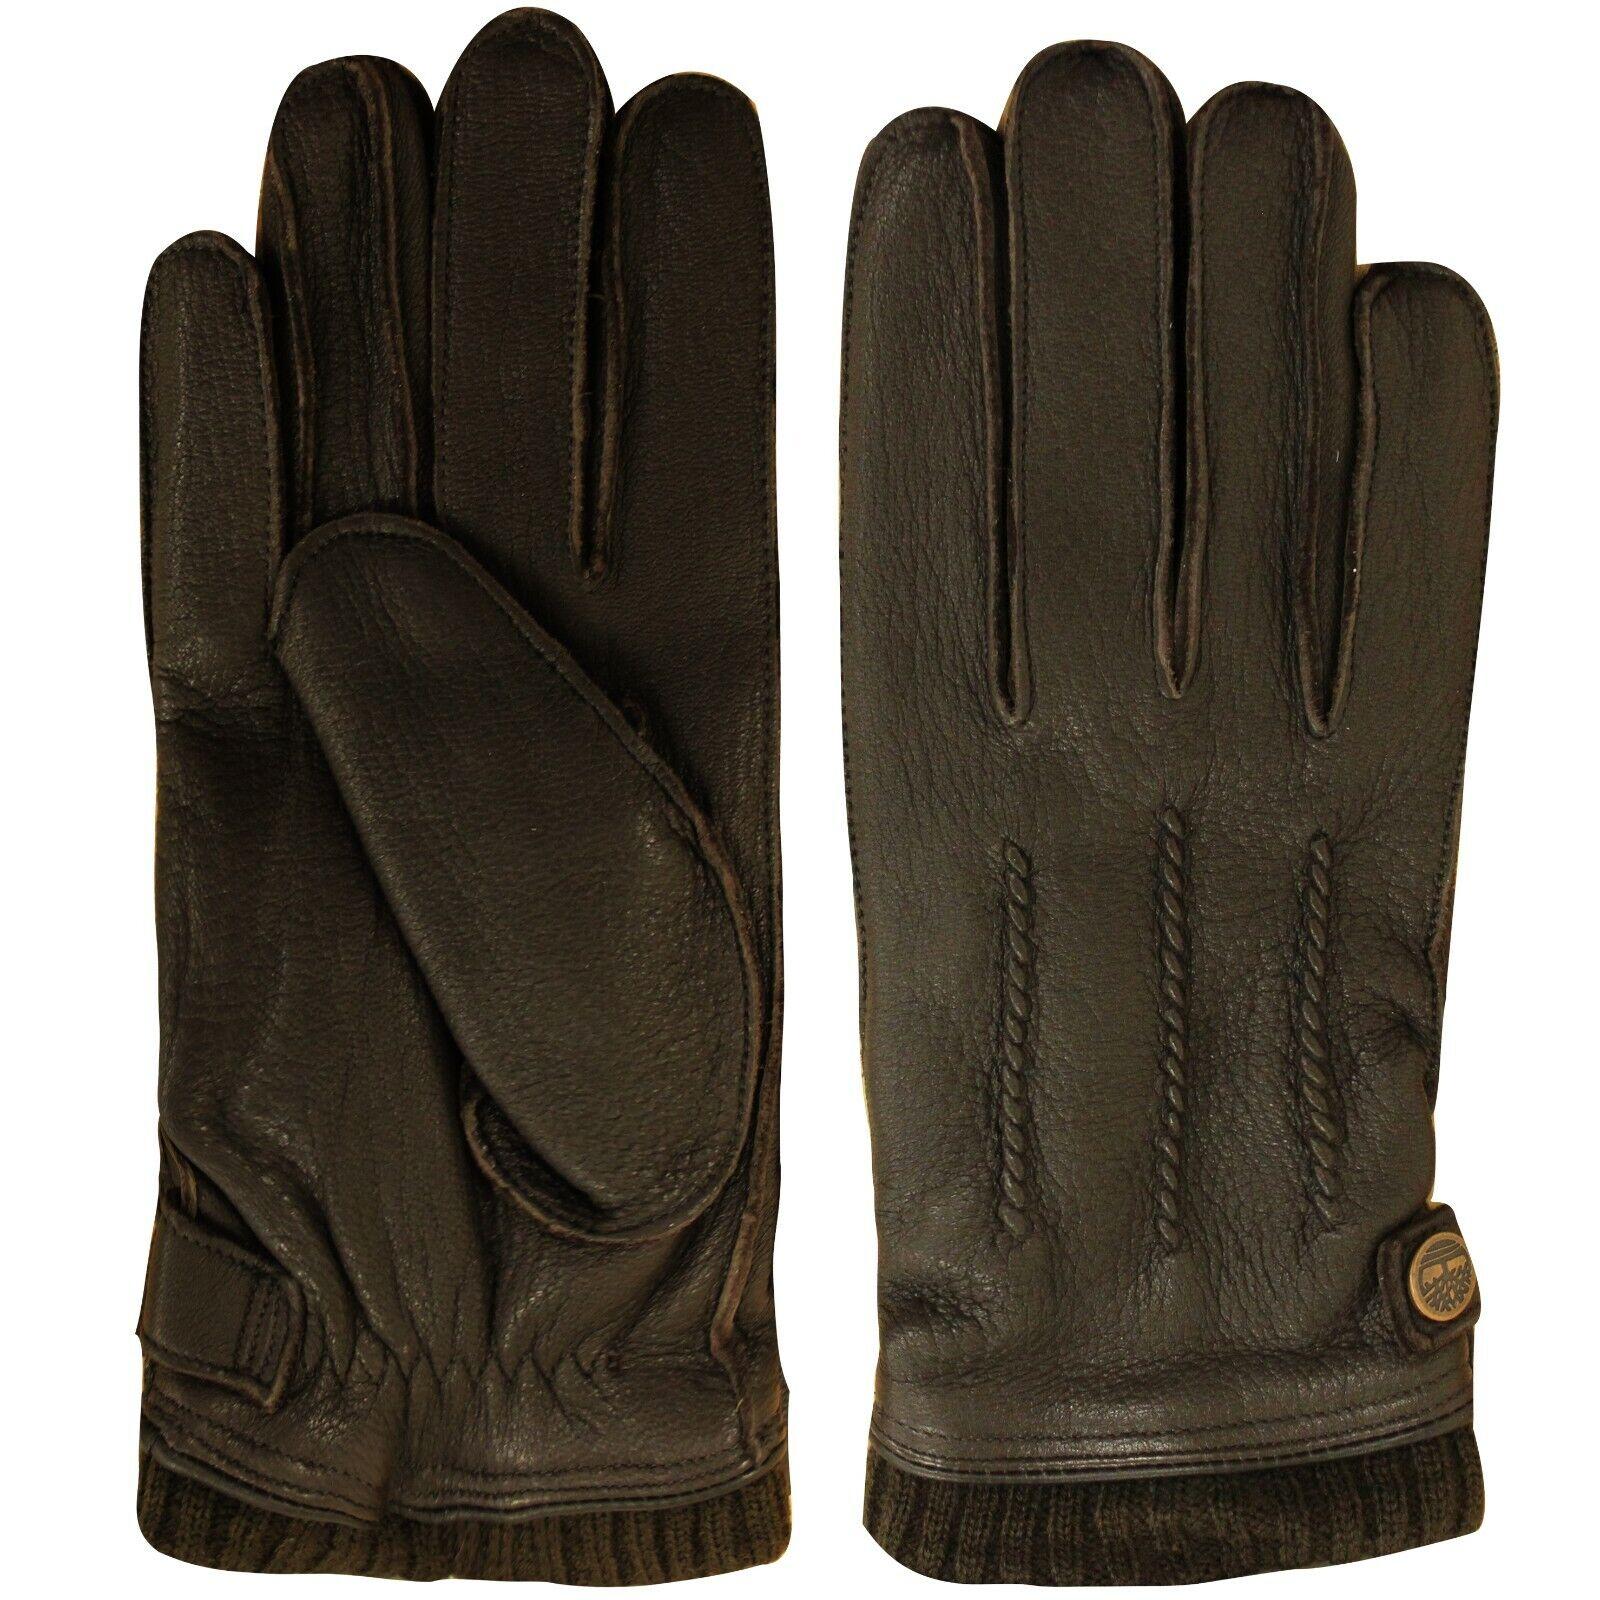 Timberland Seabrook Beach Boot Wheat Gloves